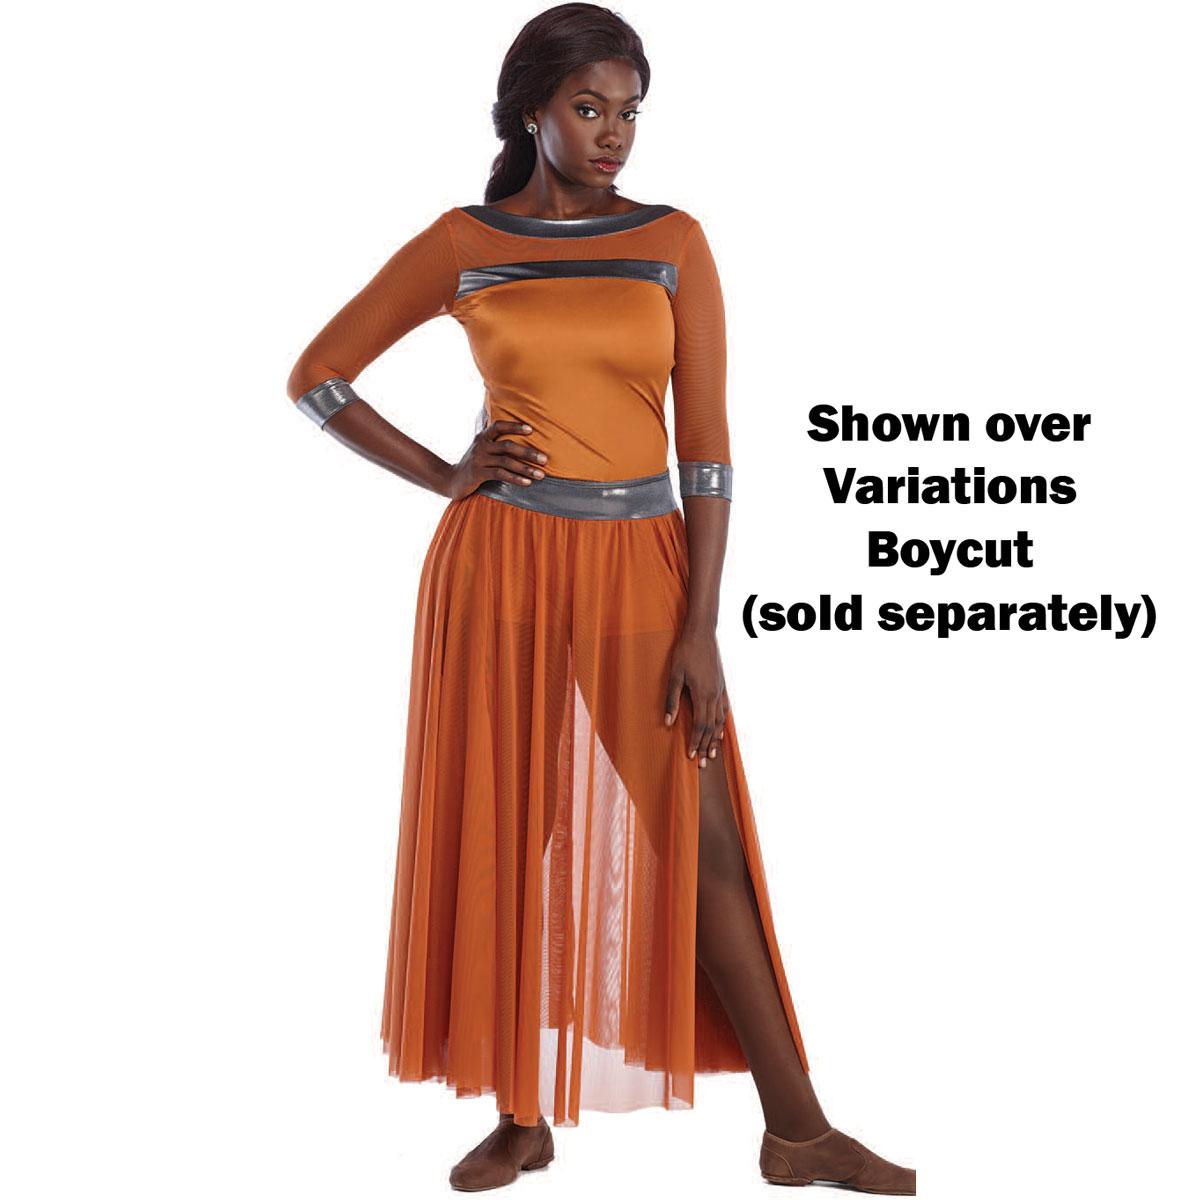 Guard Uniforms: Variations Long Skirt